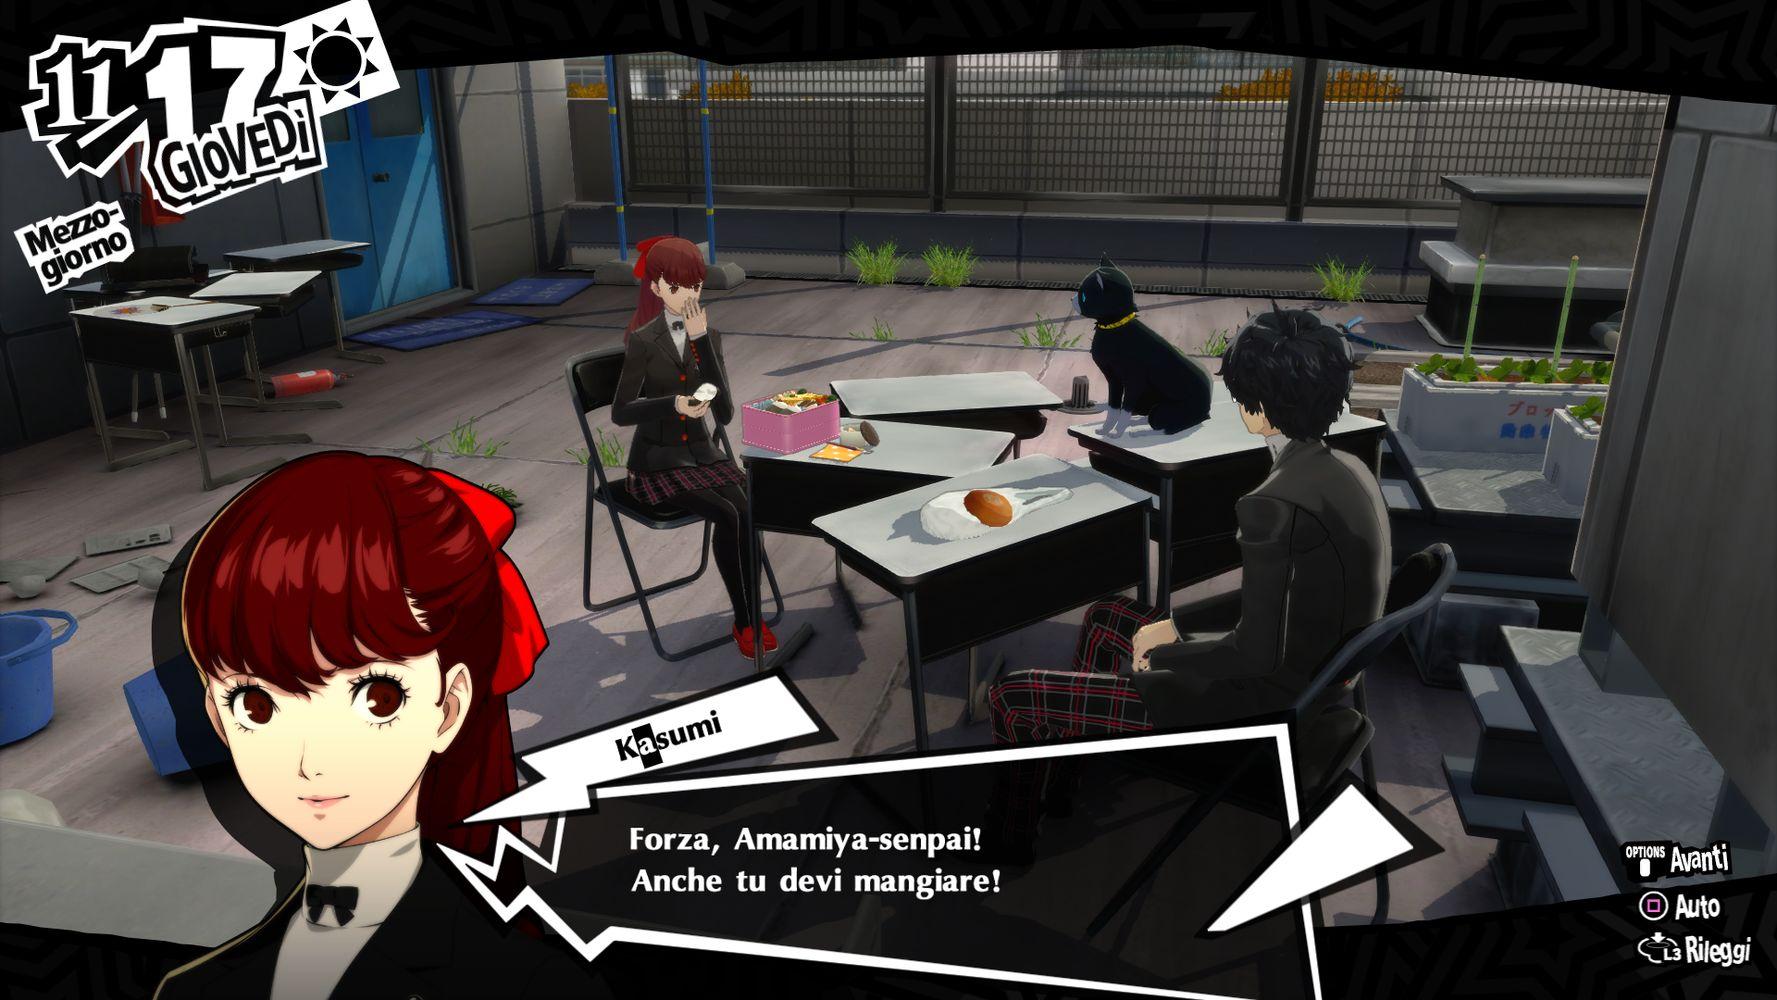 Protagonista e Kasumi, Persona 5 Royal